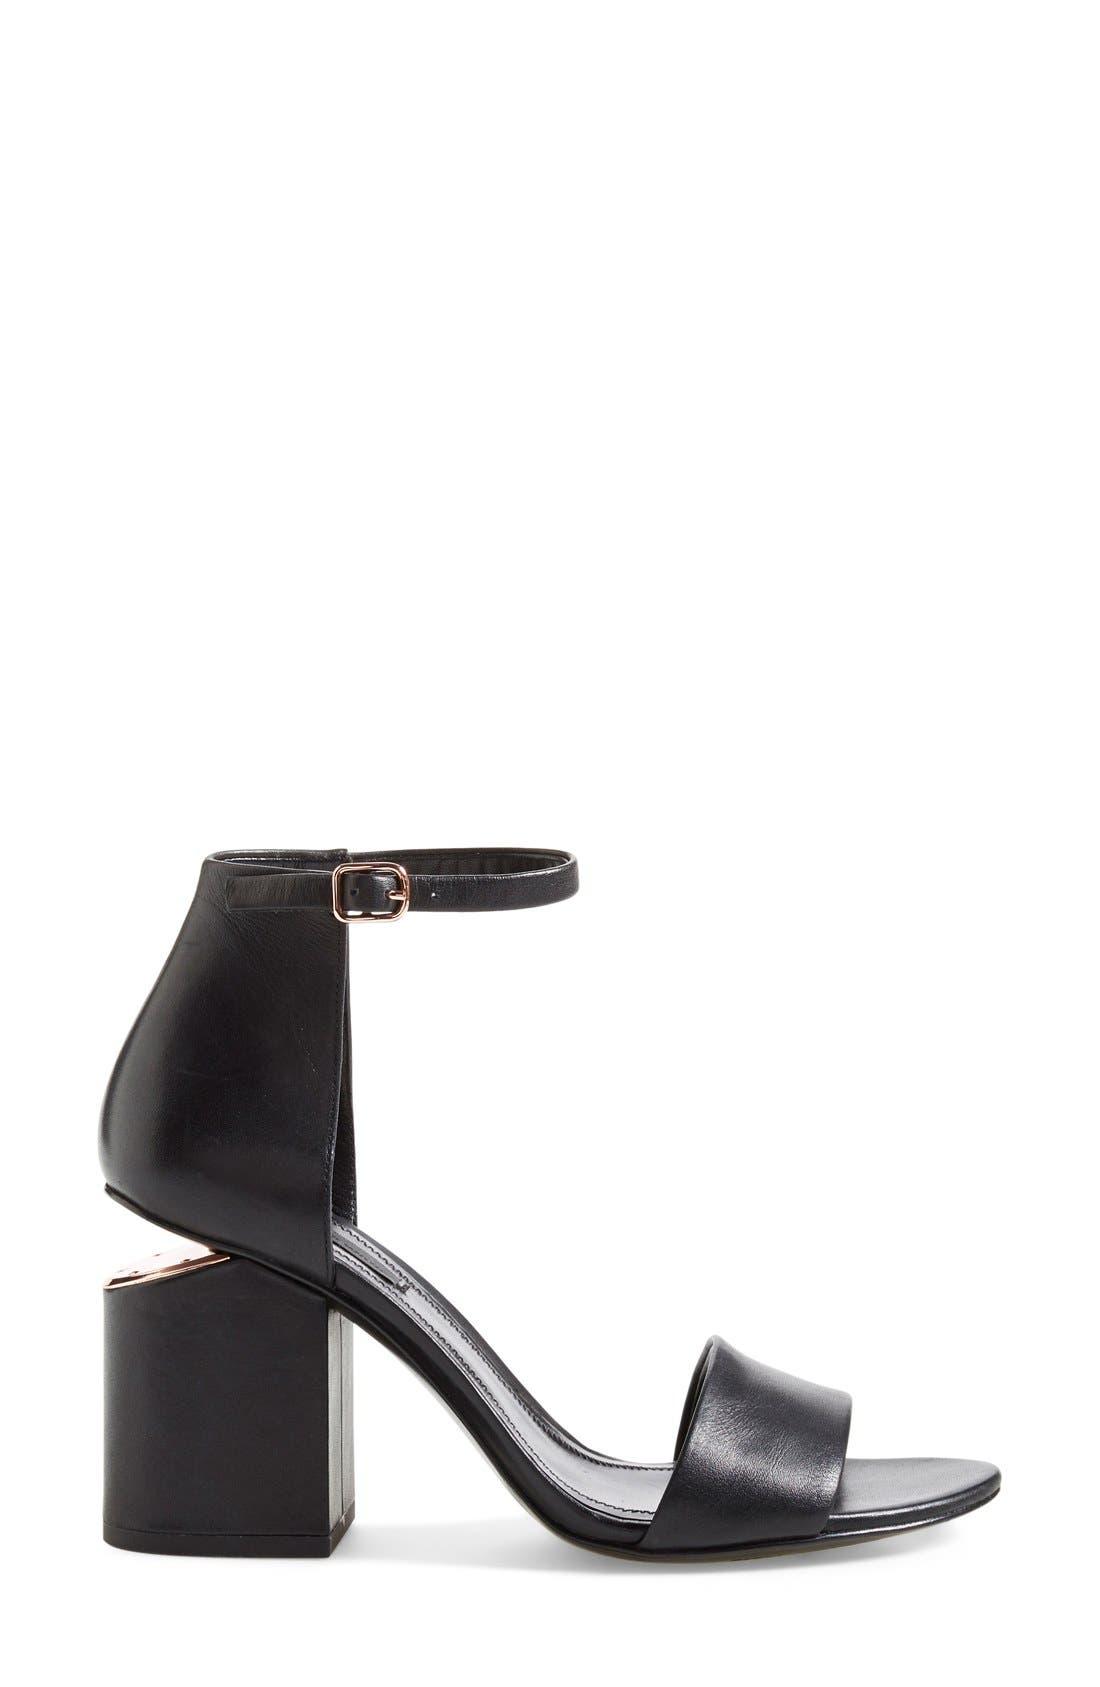 'Abby' Ankle Strap Sandal,                             Alternate thumbnail 8, color,                             BLACK